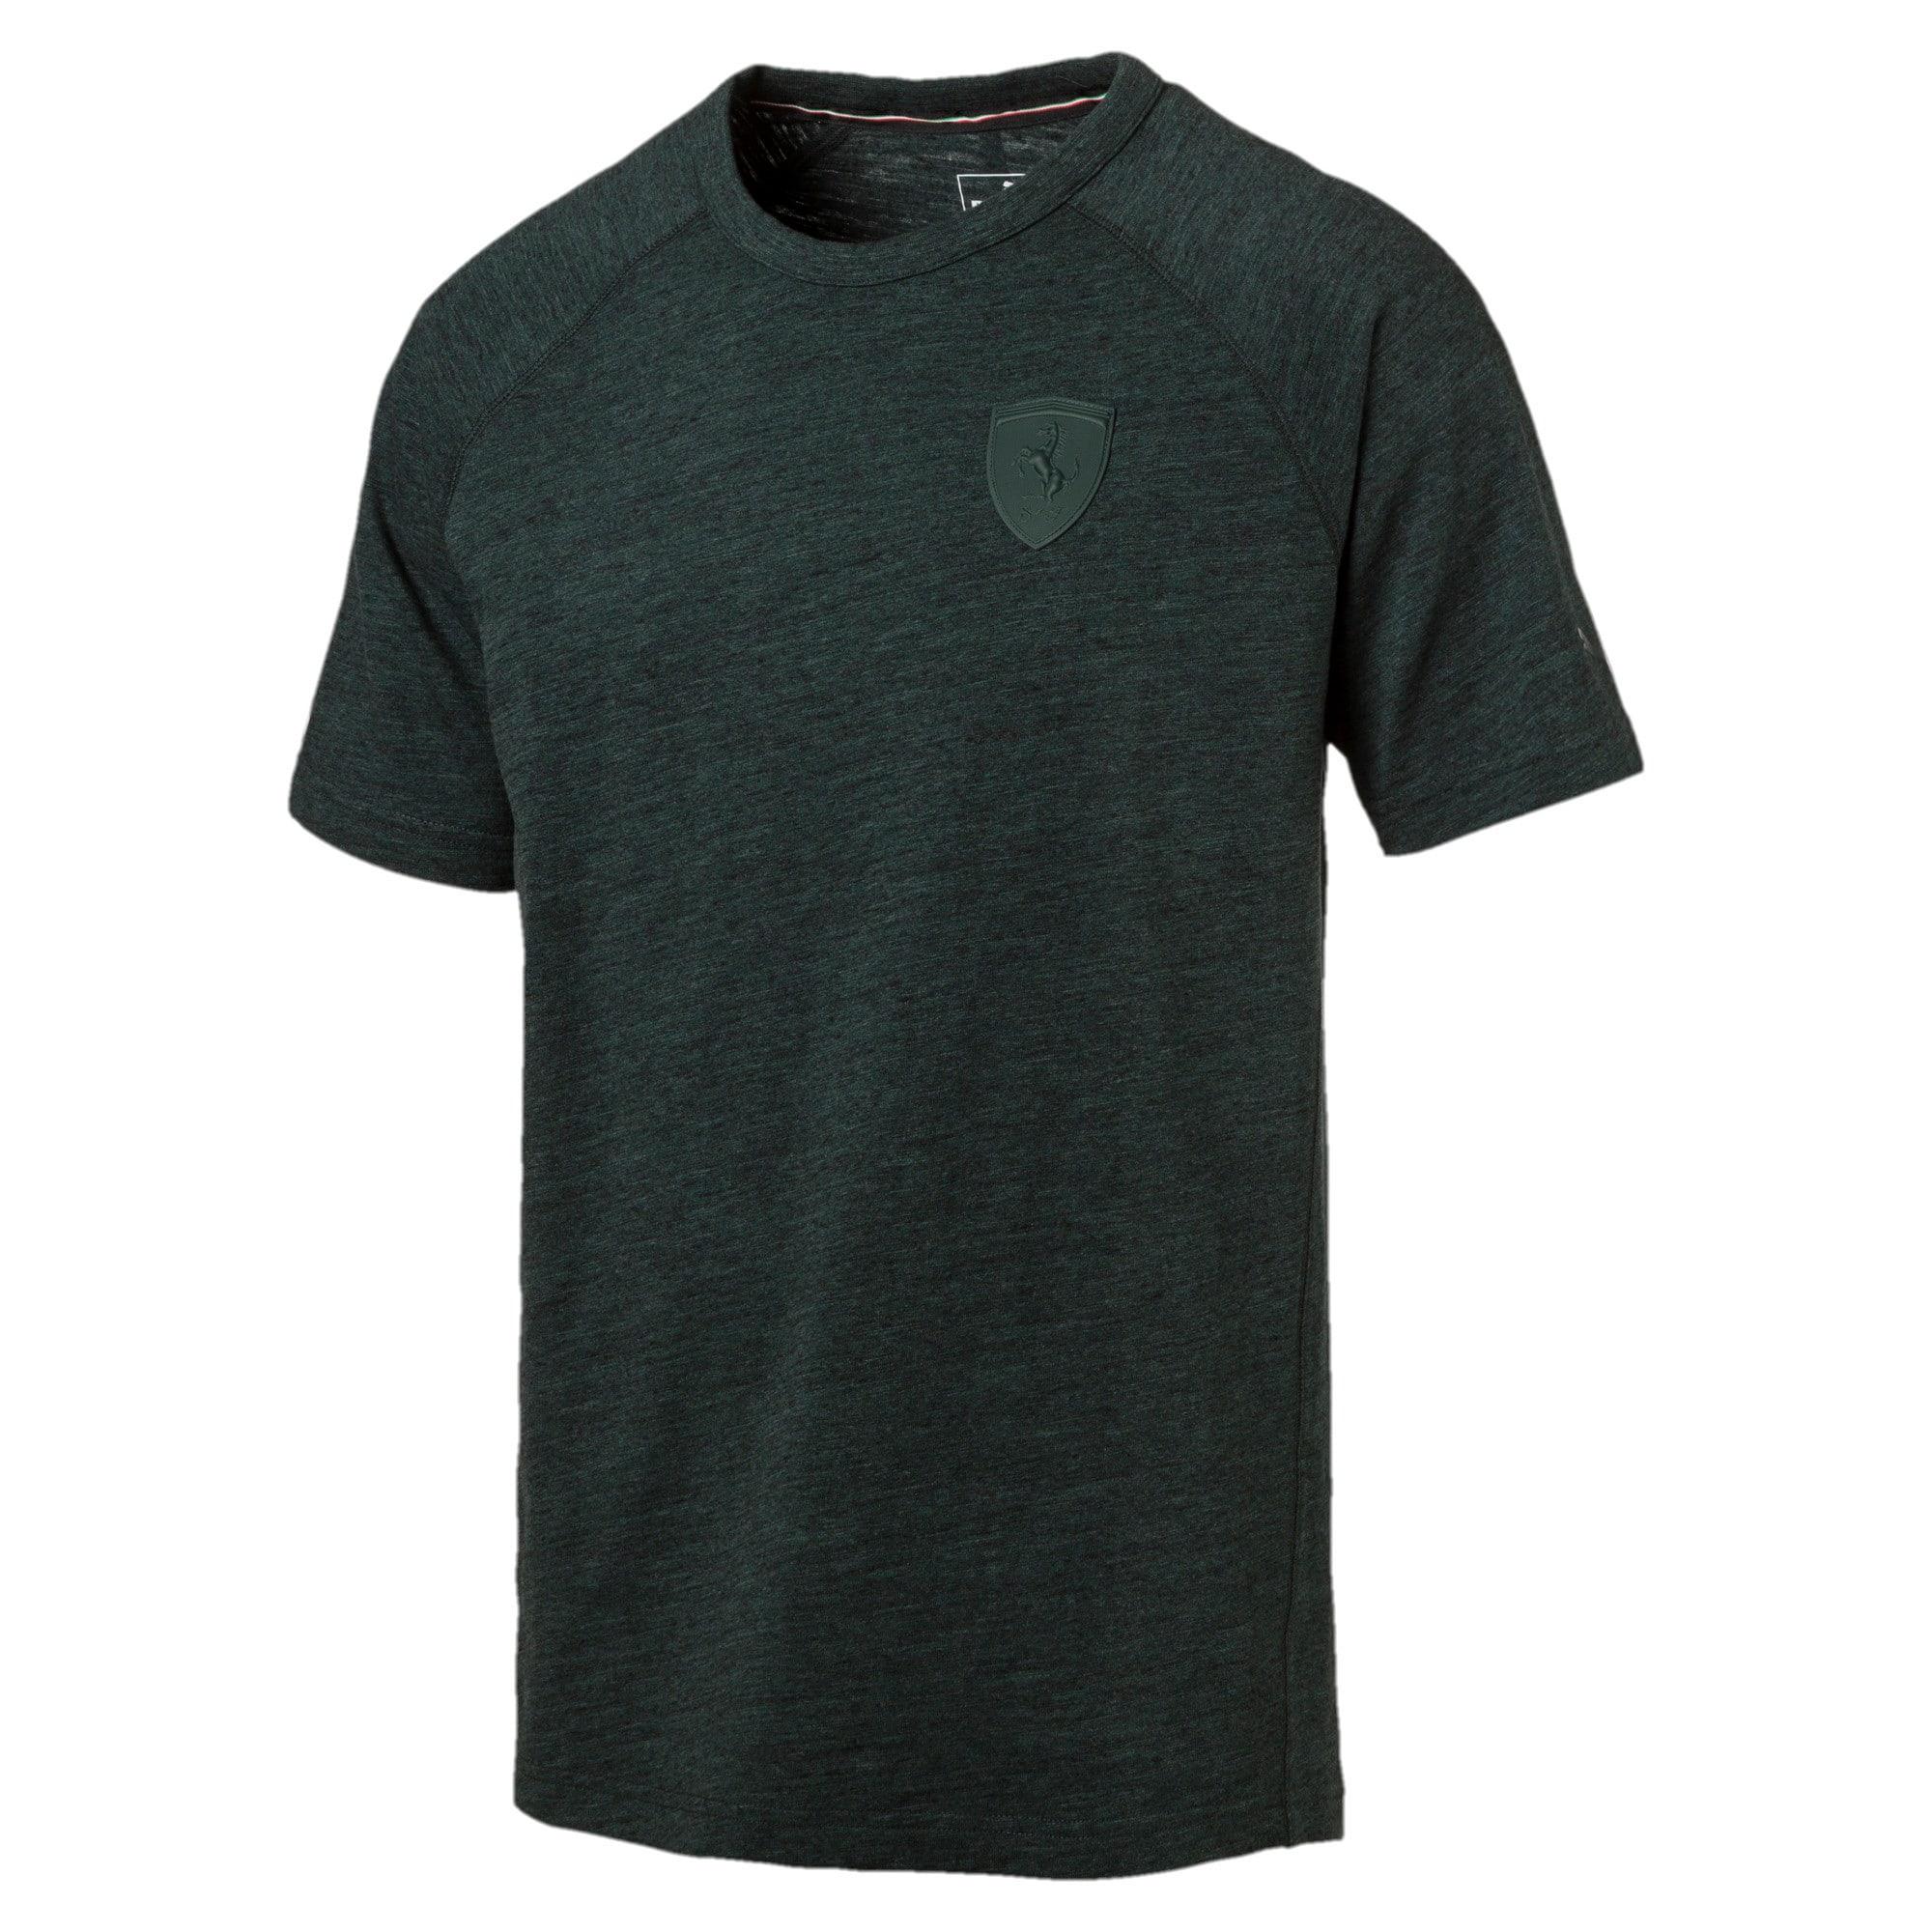 Thumbnail 2 of Ferrari Lifestyle Men's Small Shield T-Shirt, Green Gables Heather, medium-IND